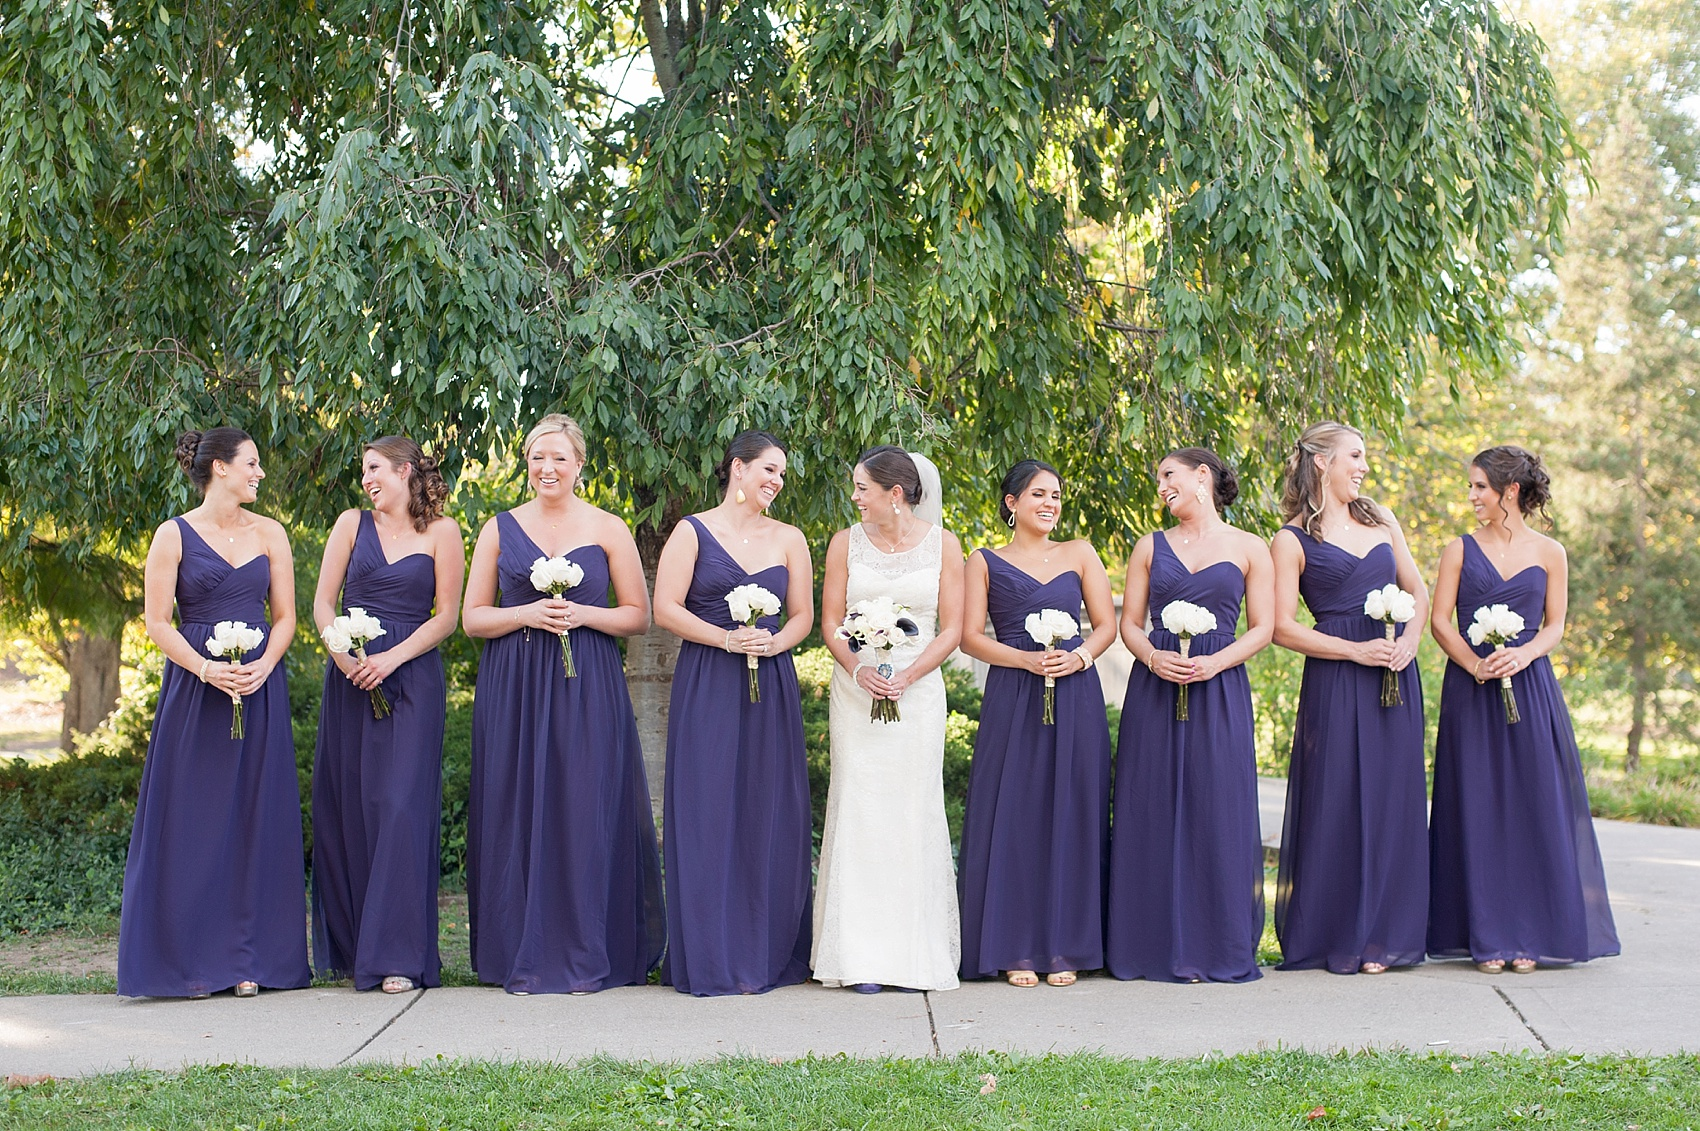 Downtown Cincinnati Wedding Photos • The Center • Shandyn + Luis ...